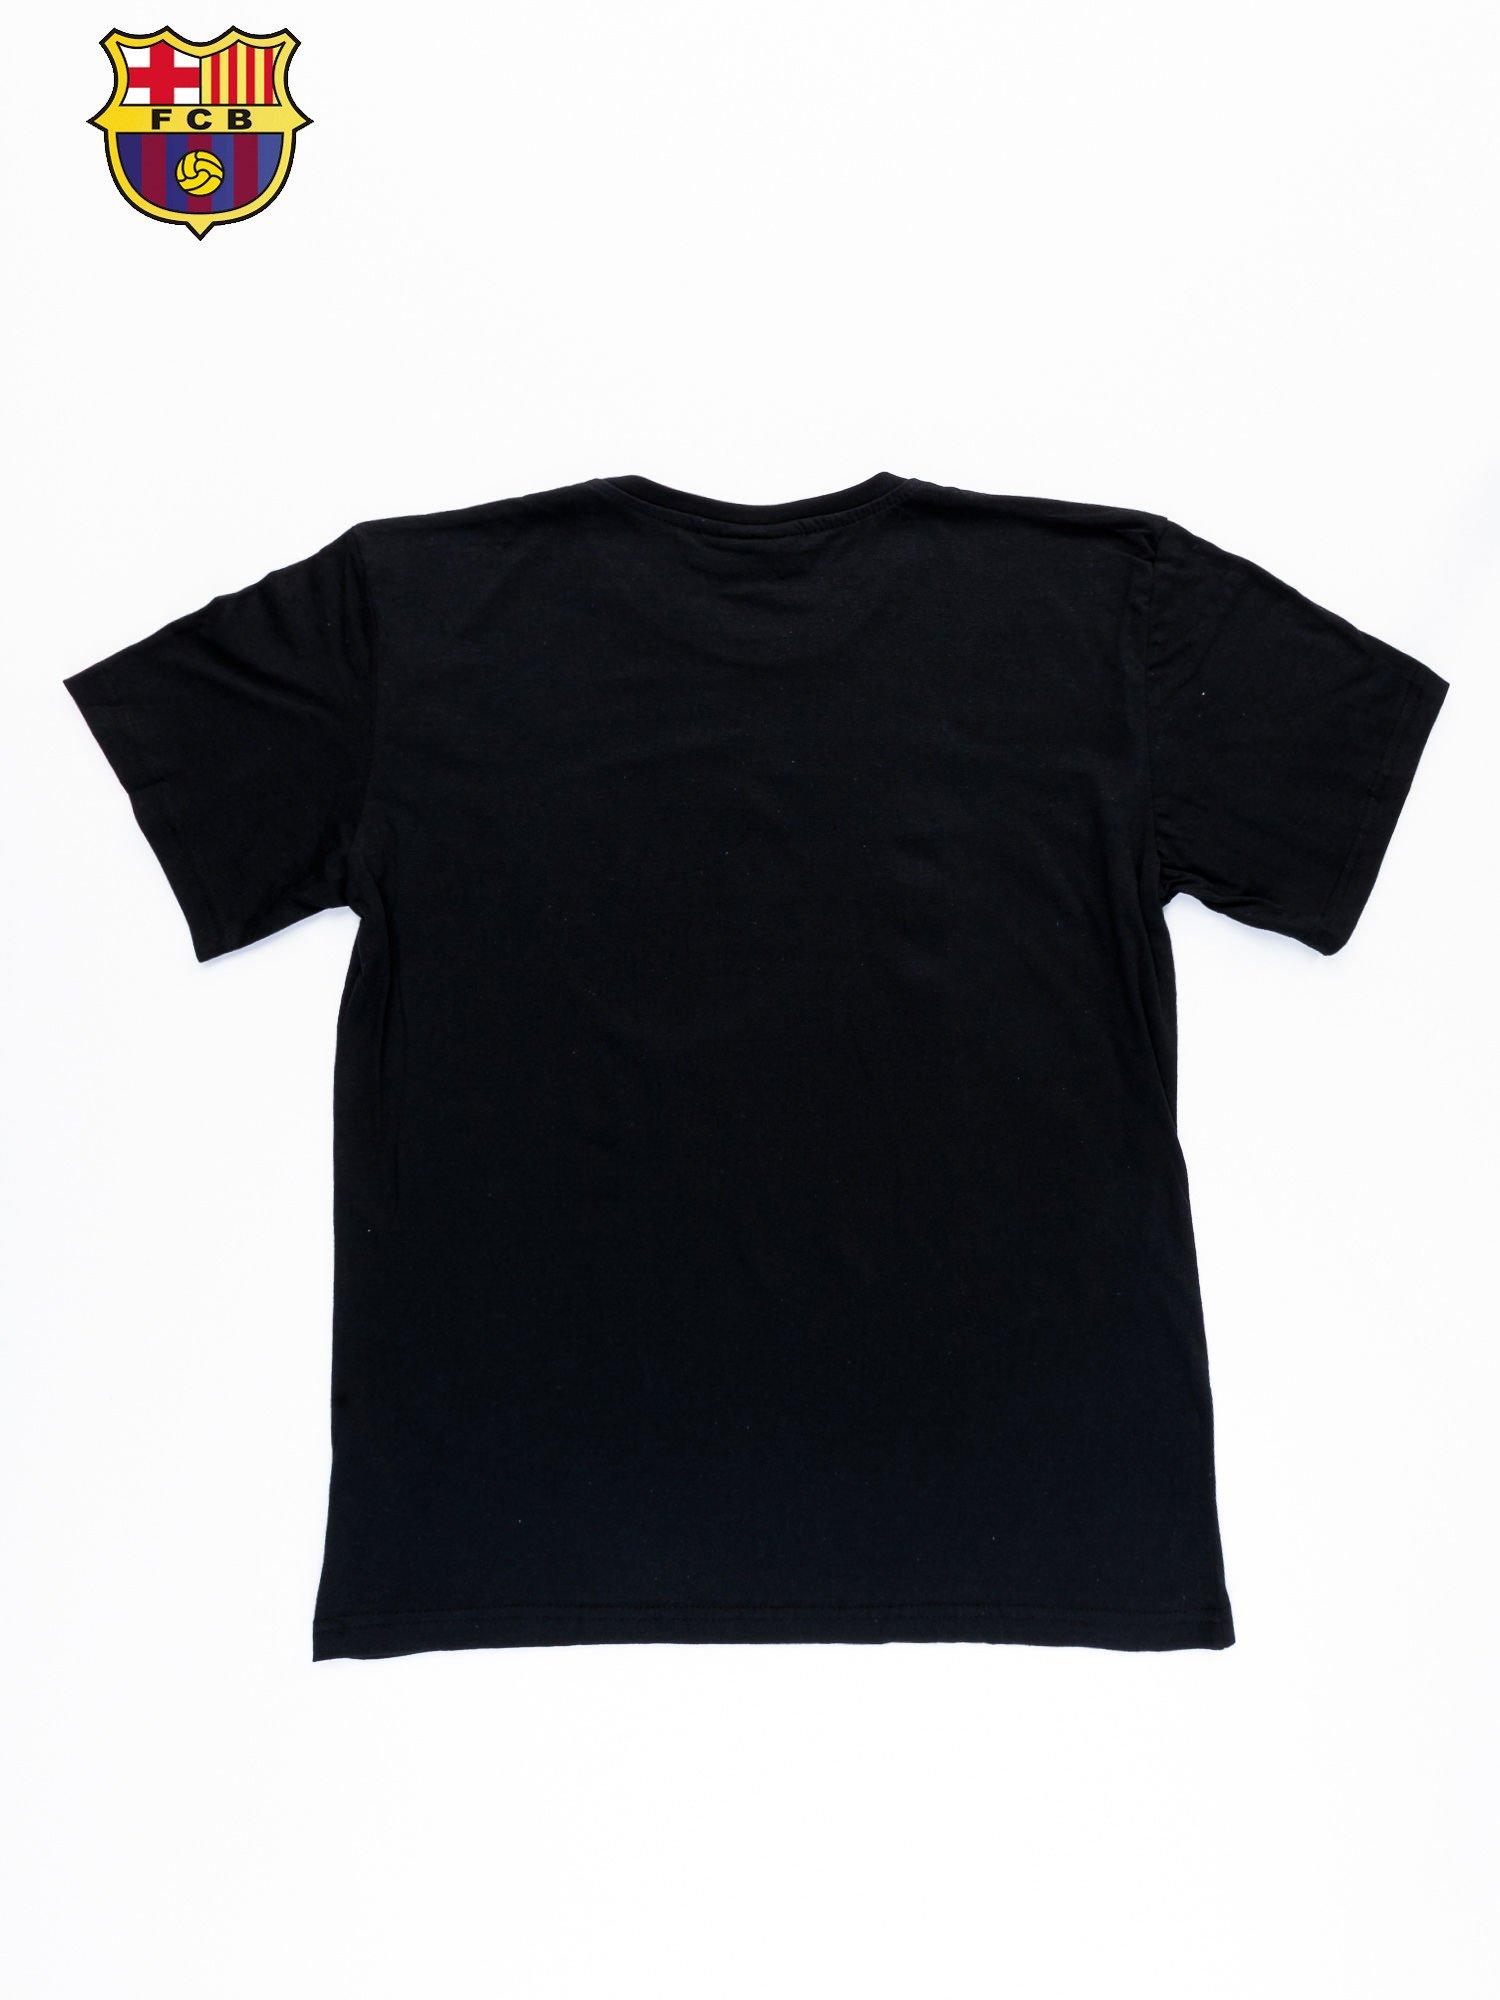 Czarny t-shirt męski FC BARCELONA                                  zdj.                                  11